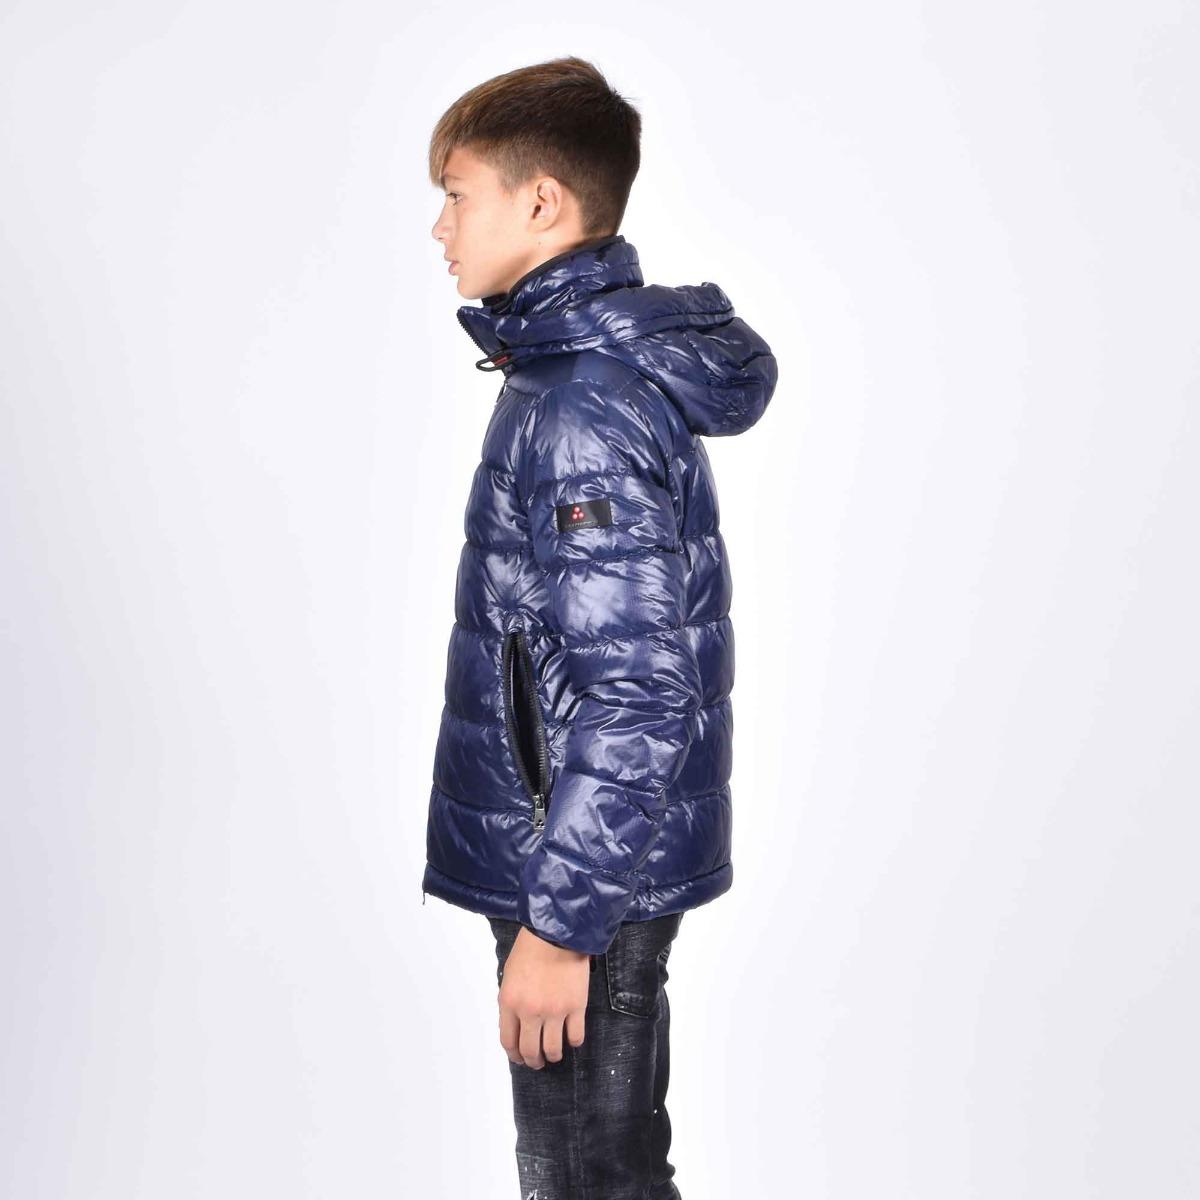 Giubbino boggs cy 01 kid- Blu